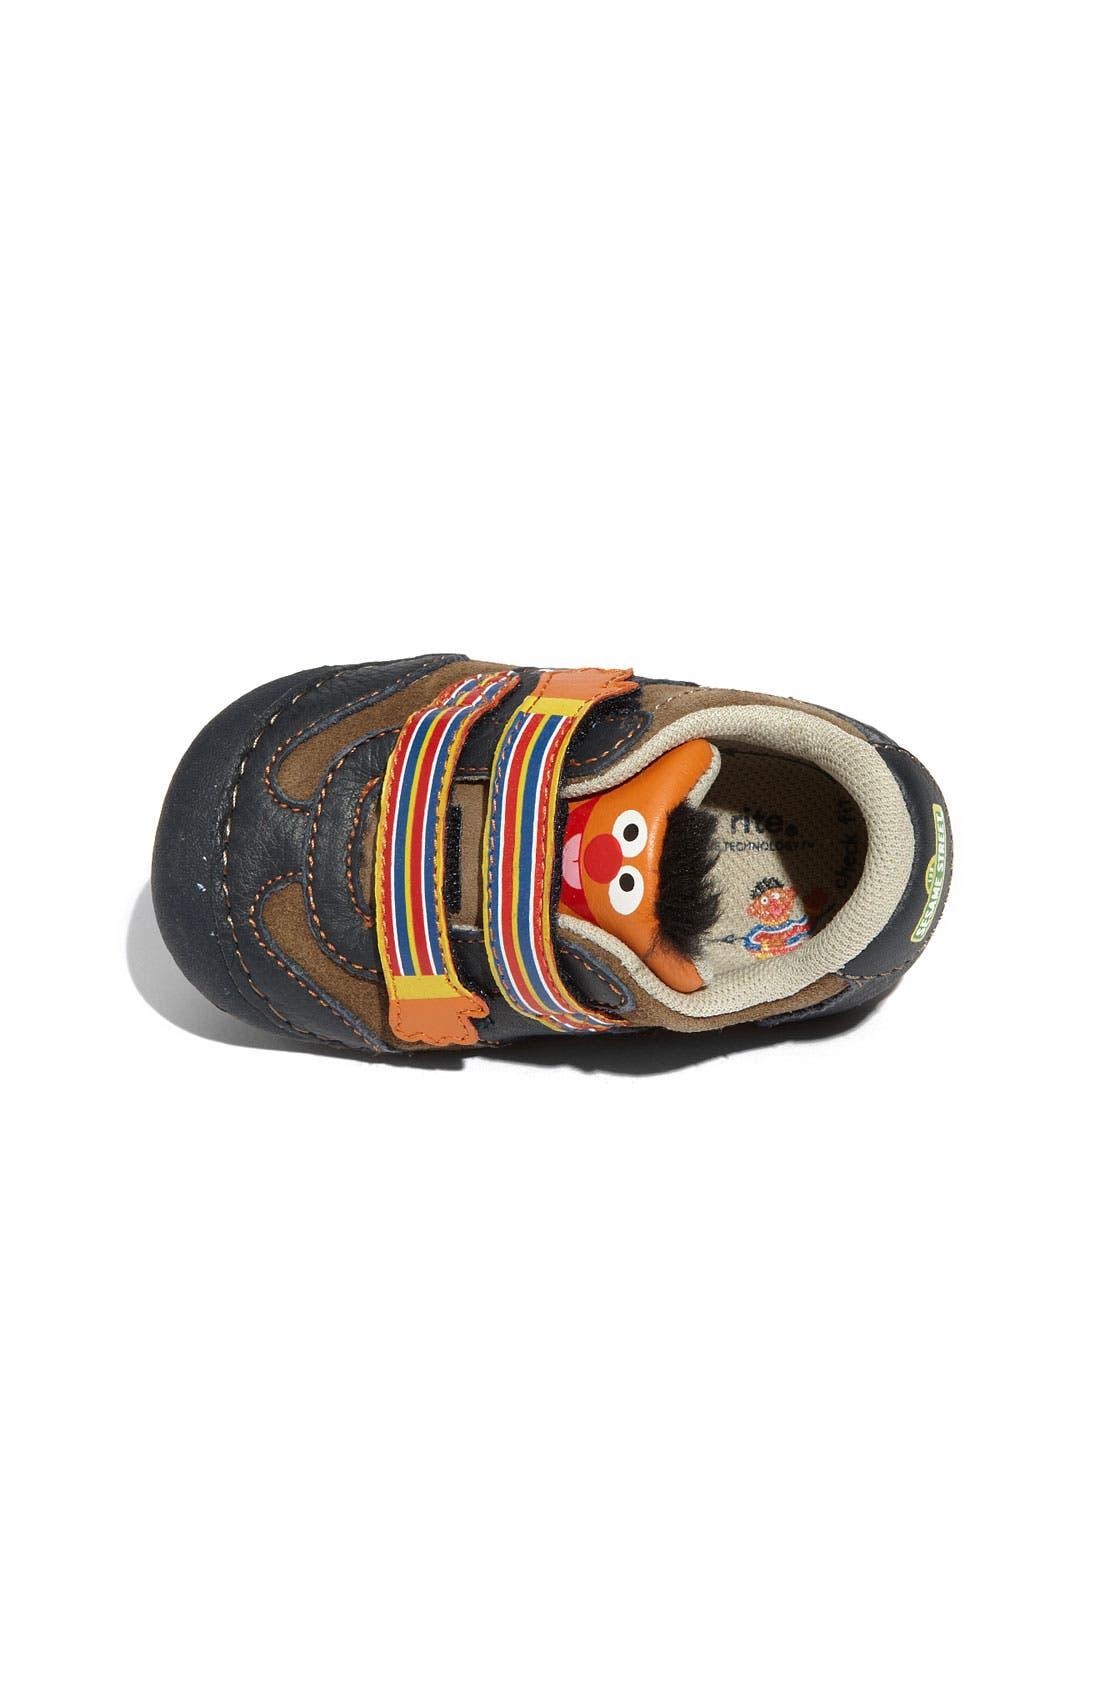 Alternate Image 3  - Stride Rite 'Sesame Street® - Ernie' Sneaker (Baby & Walker)